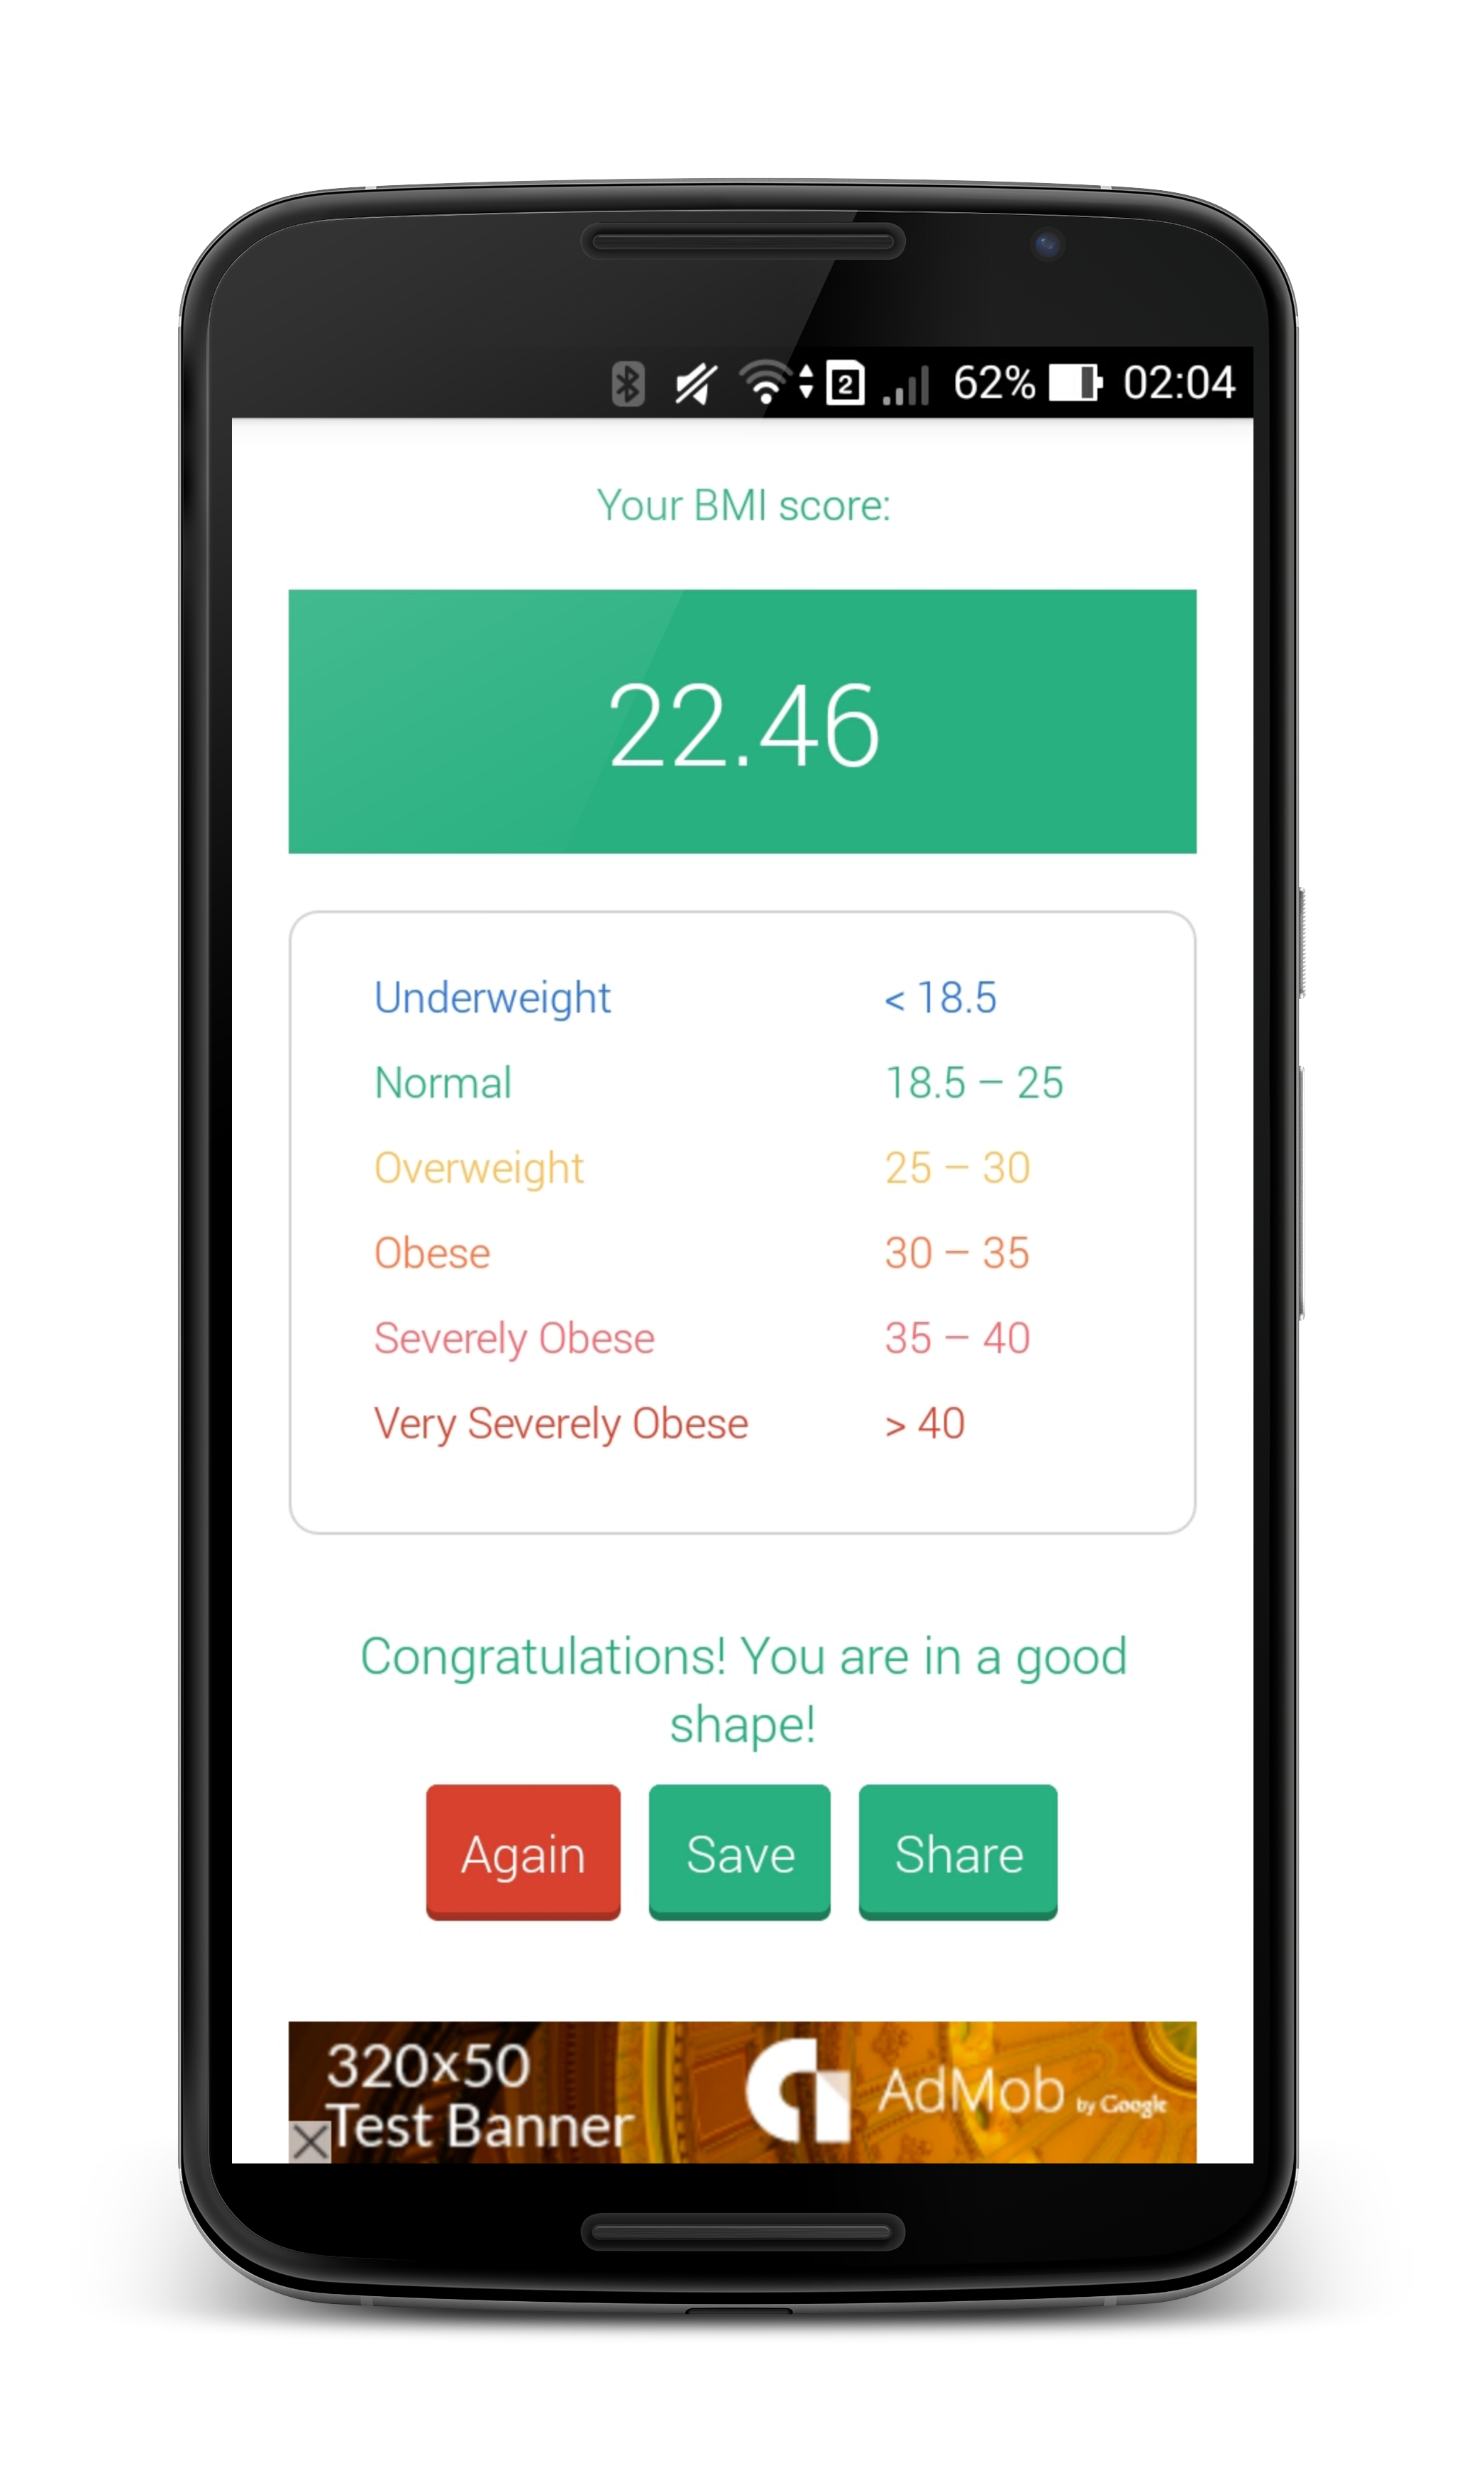 BMI/BFP Calculator with Admob & Flat UI by benten_studio | CodeCanyon